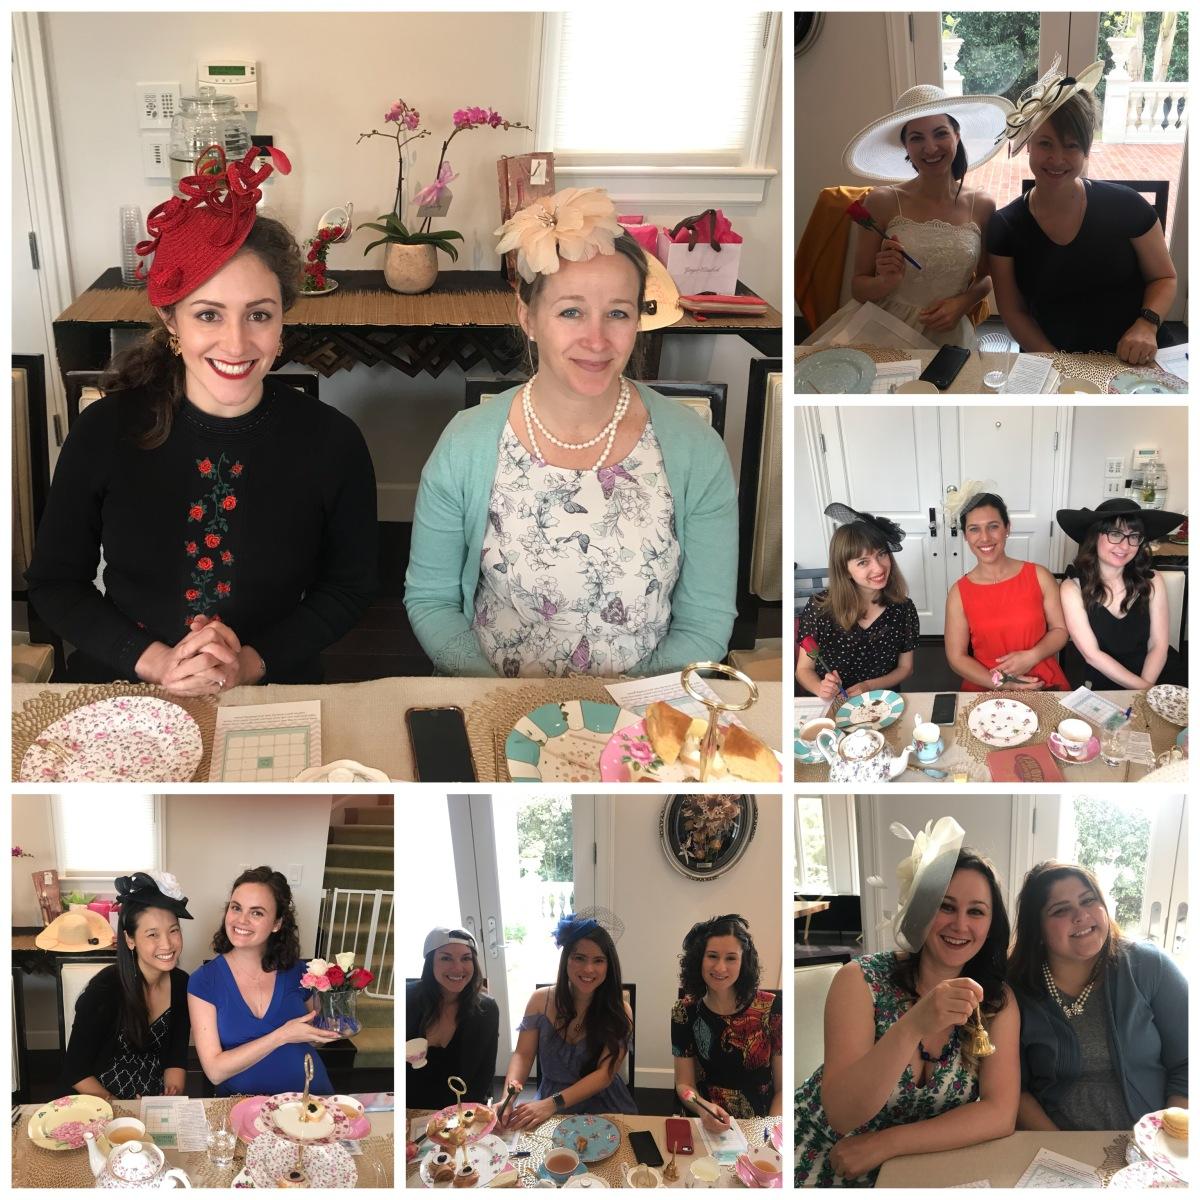 Lovely tea party ladies